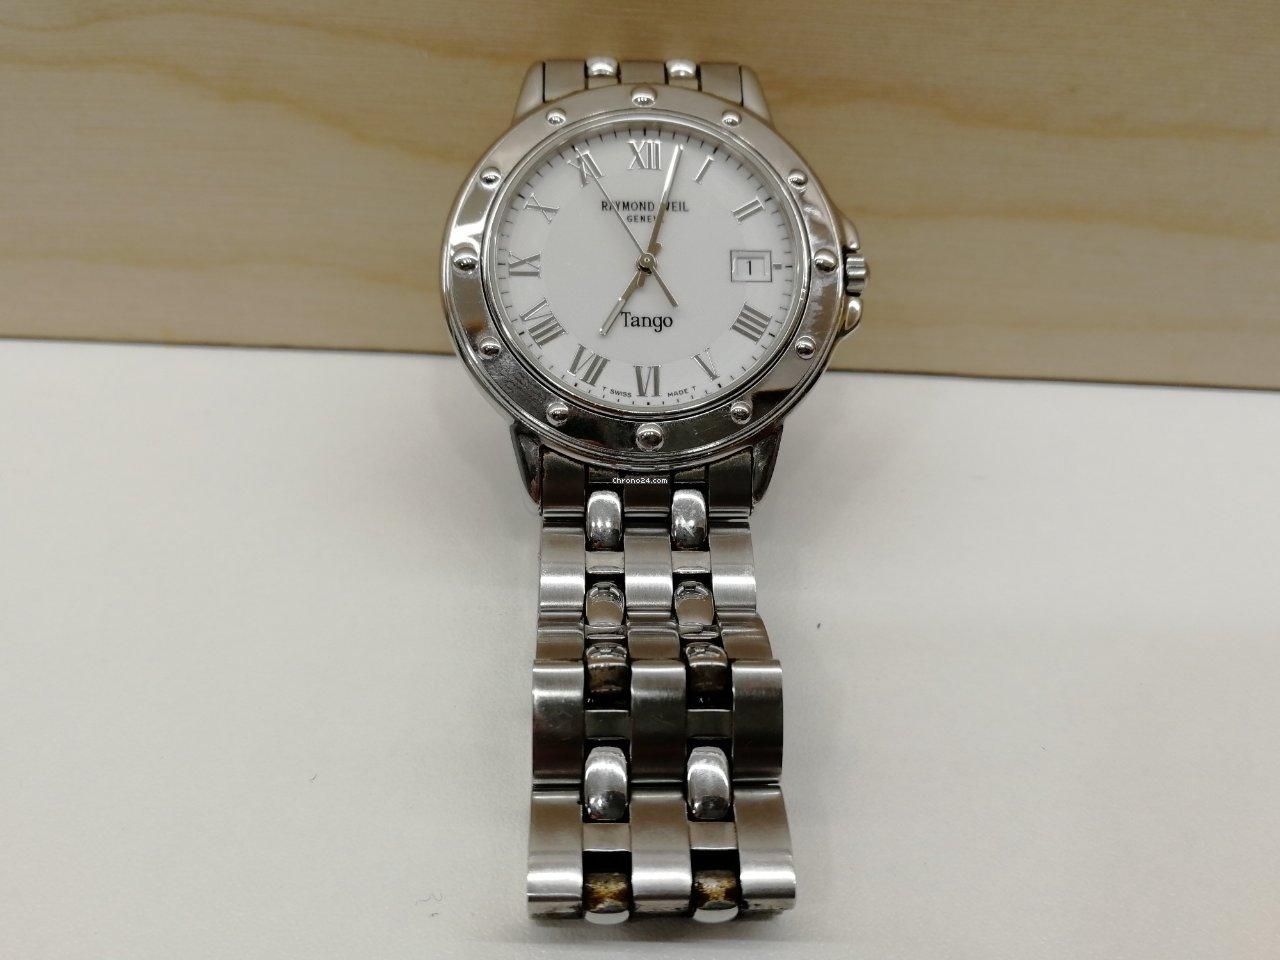 Koupě hodinek Raymond Weil  cb8f107729